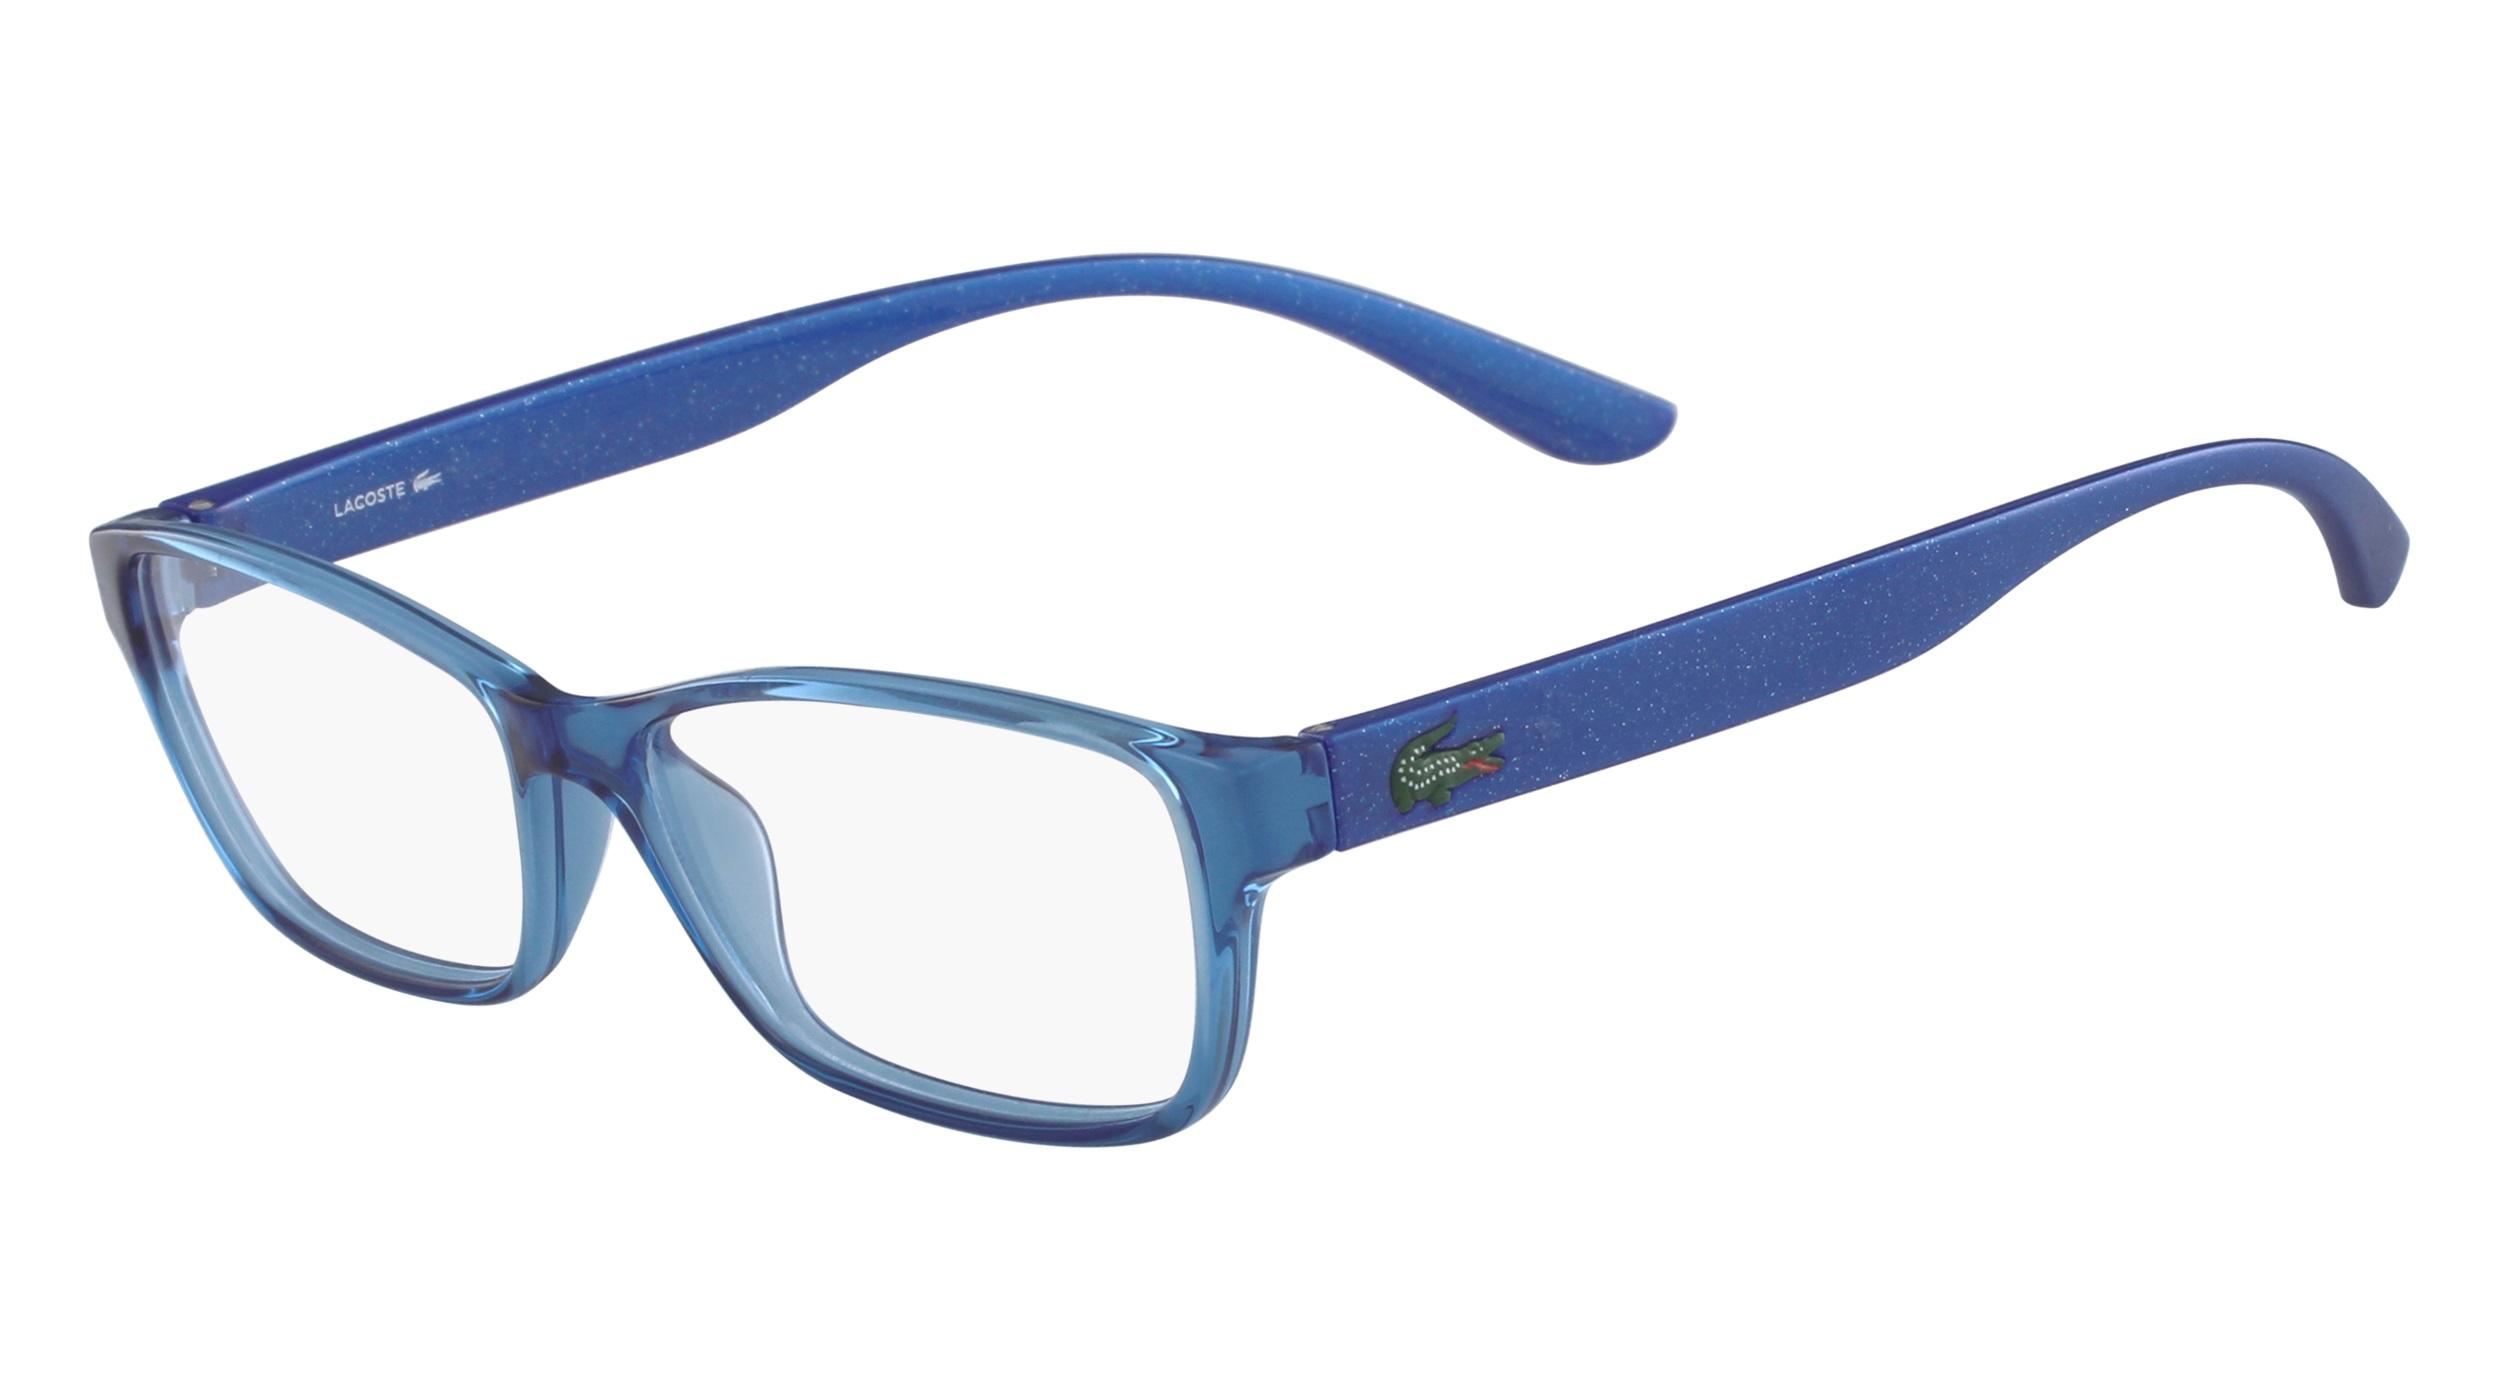 270f868b36371 Eyewear for Kids - Boy Blue - Optiwow